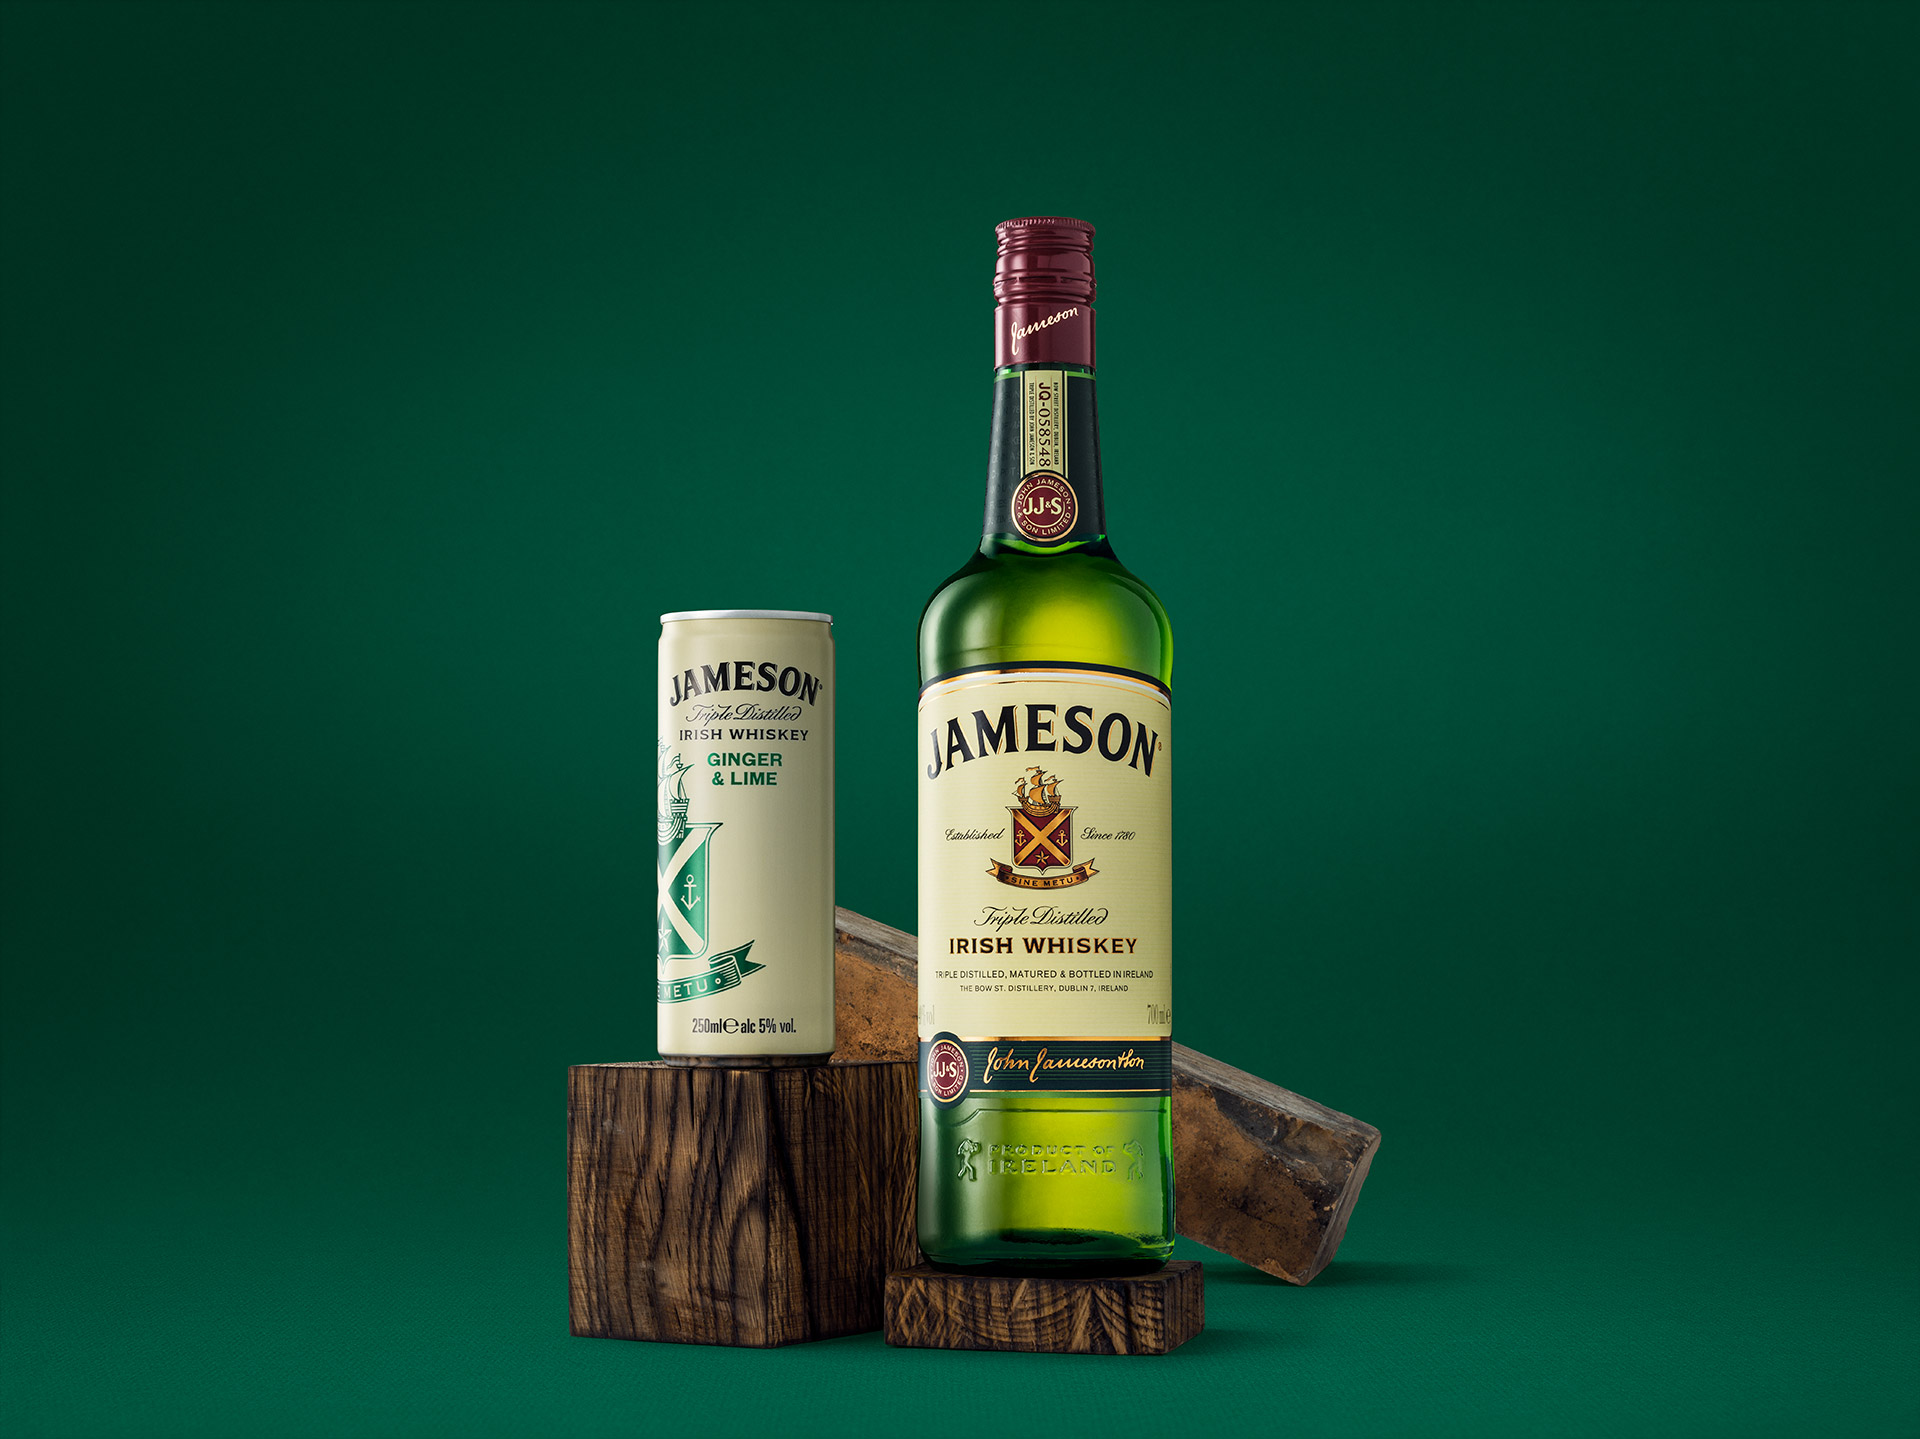 jameson_corporate_uk_rtd_green_WEB.jpg